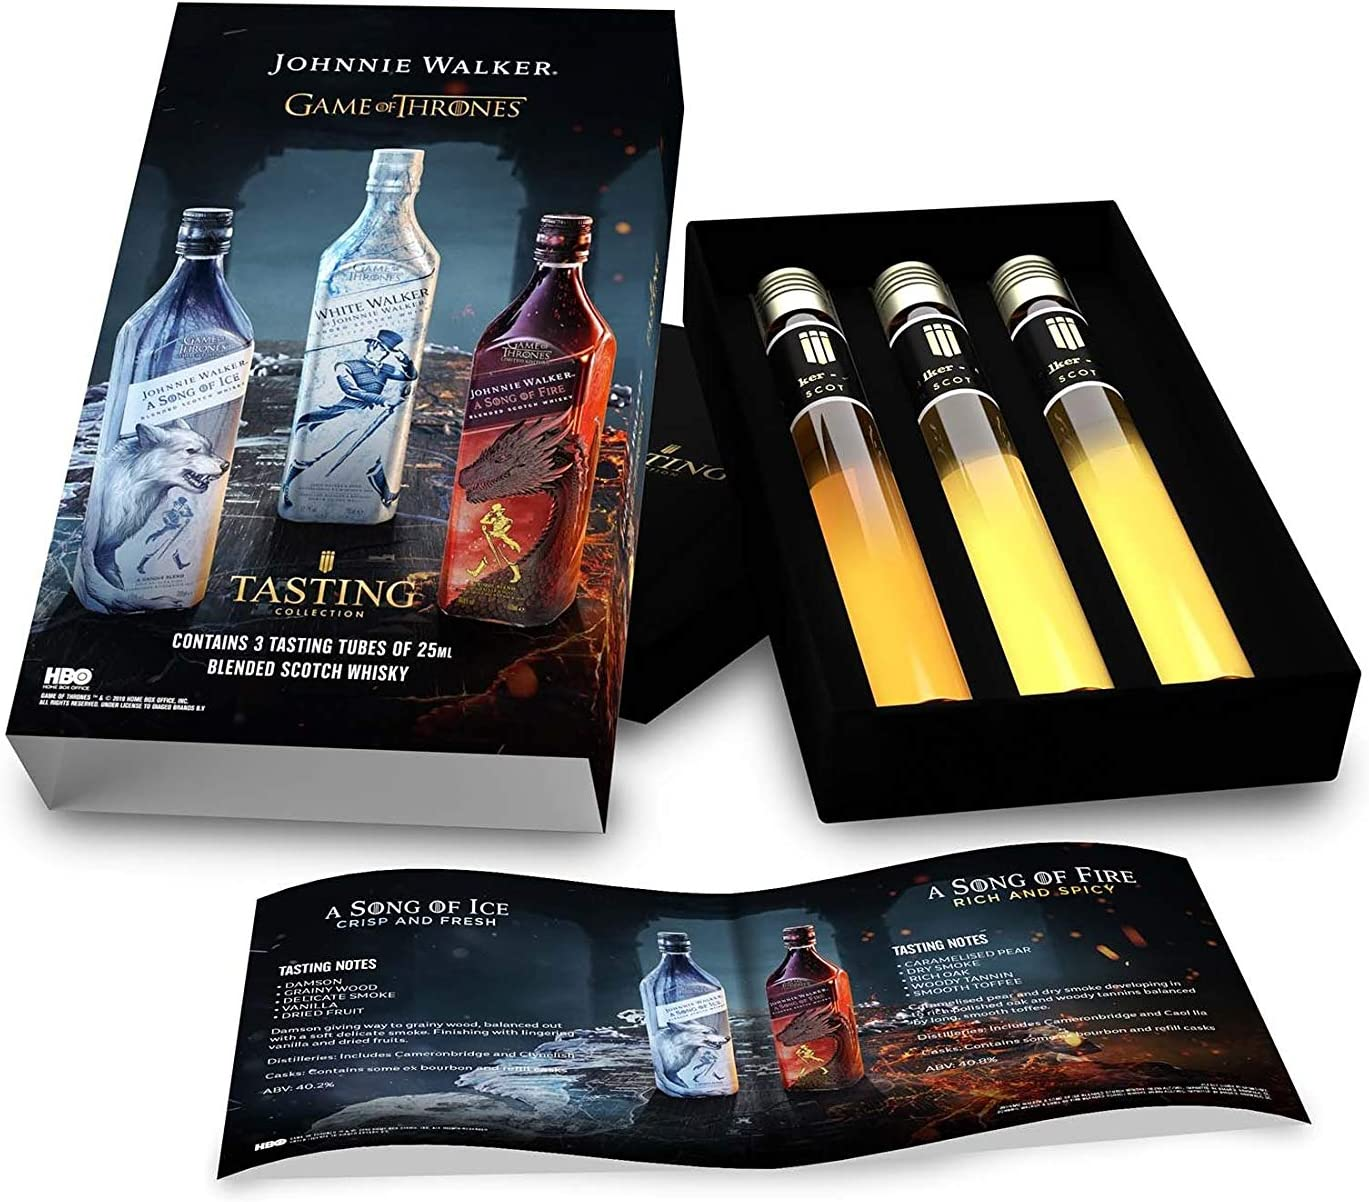 Johnnie Walker - Game Of Thrones 3 x Miniatures Tasting Pack Gift ...